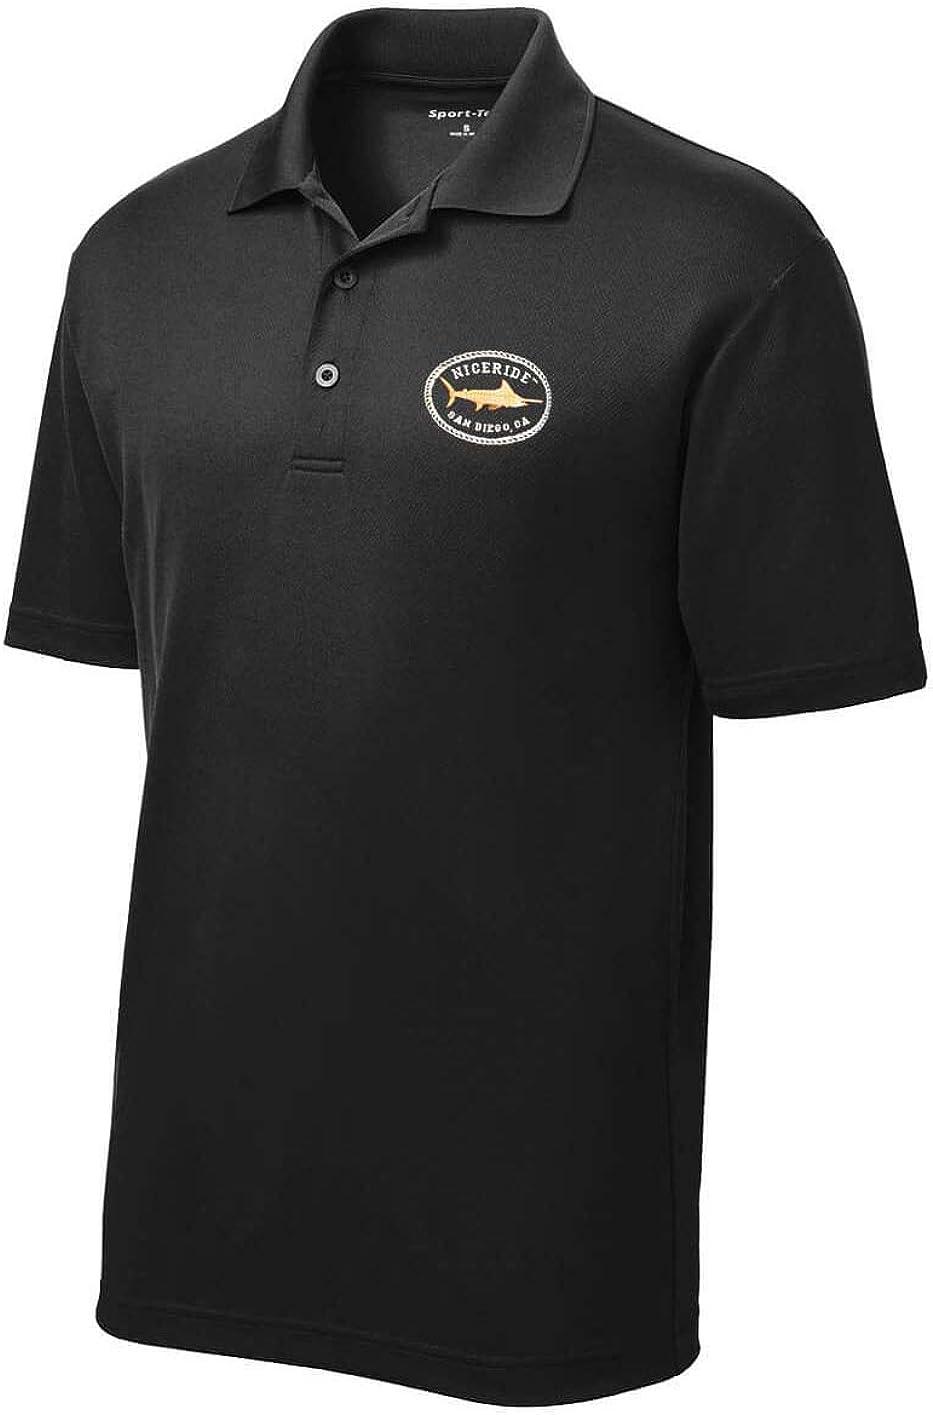 Reeling It Sales for sale in - Shirt Polo Elegant Men's Golf